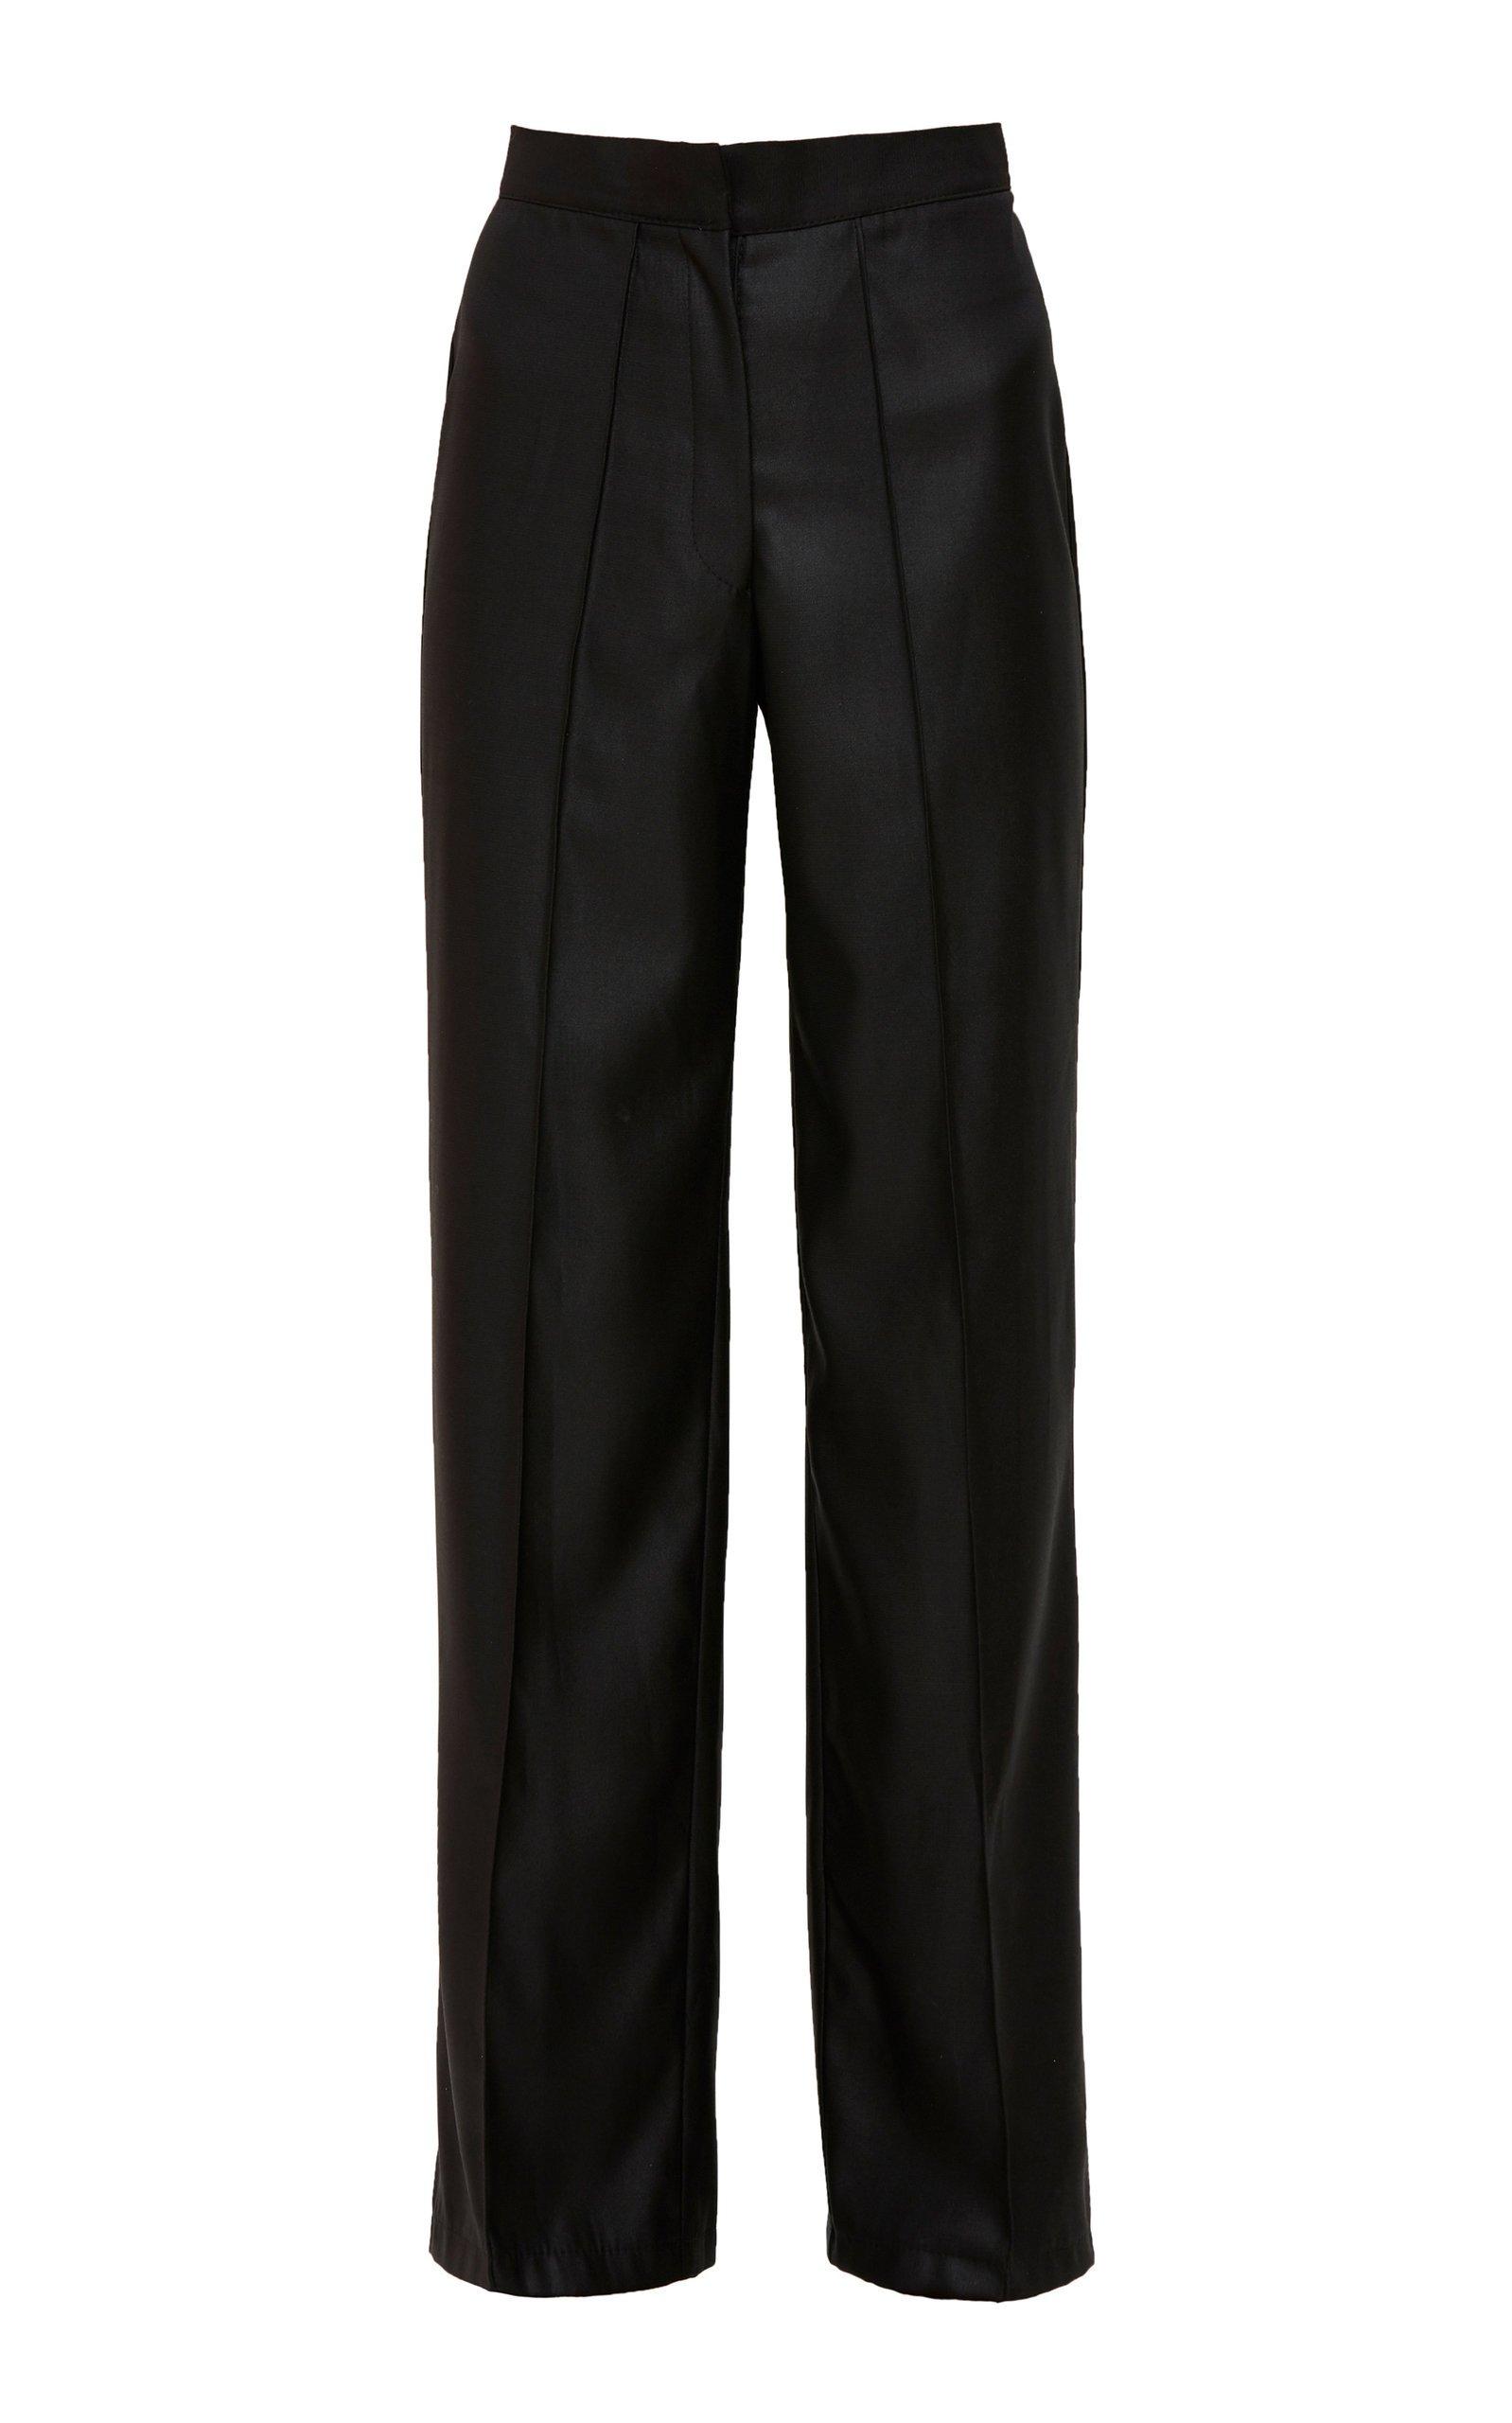 Mach & Mach Wide Leg Black Trousers